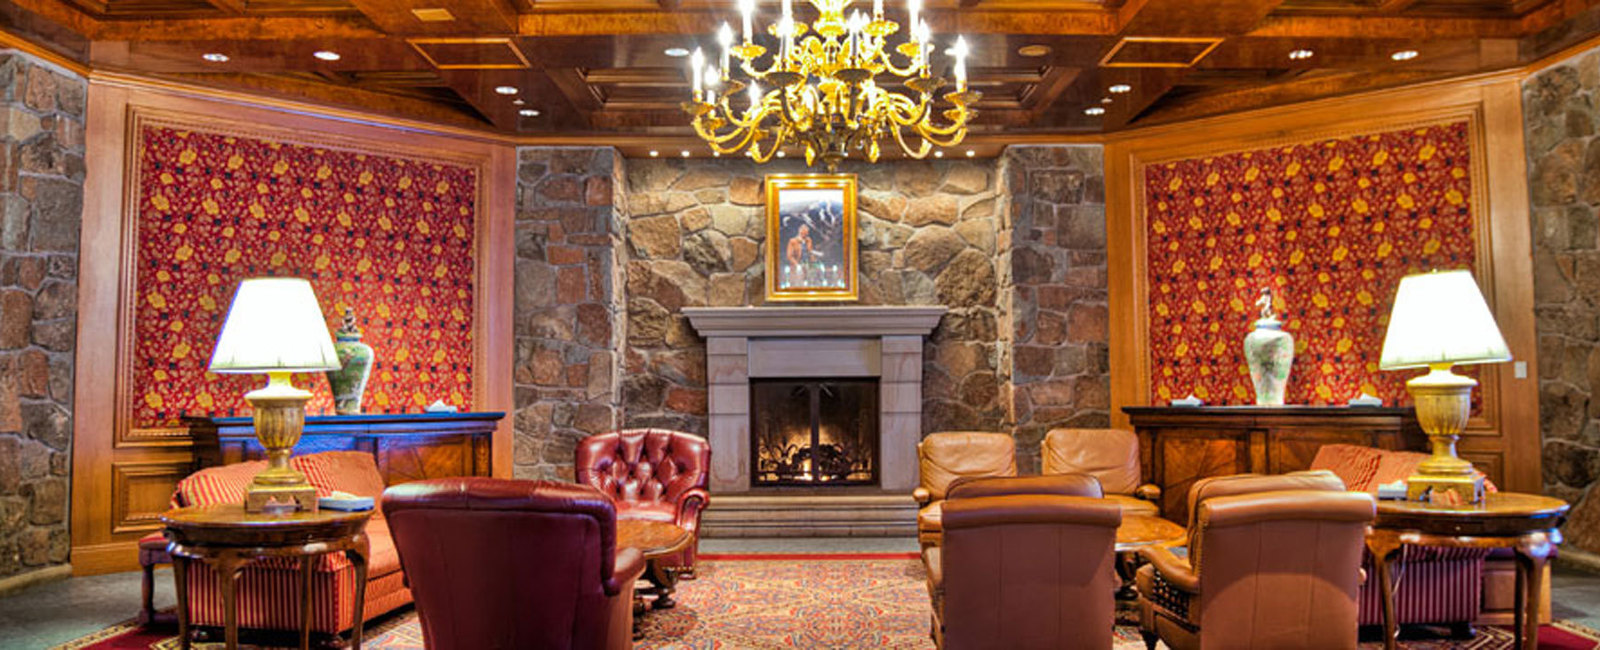 Image result for snowbasin lodge